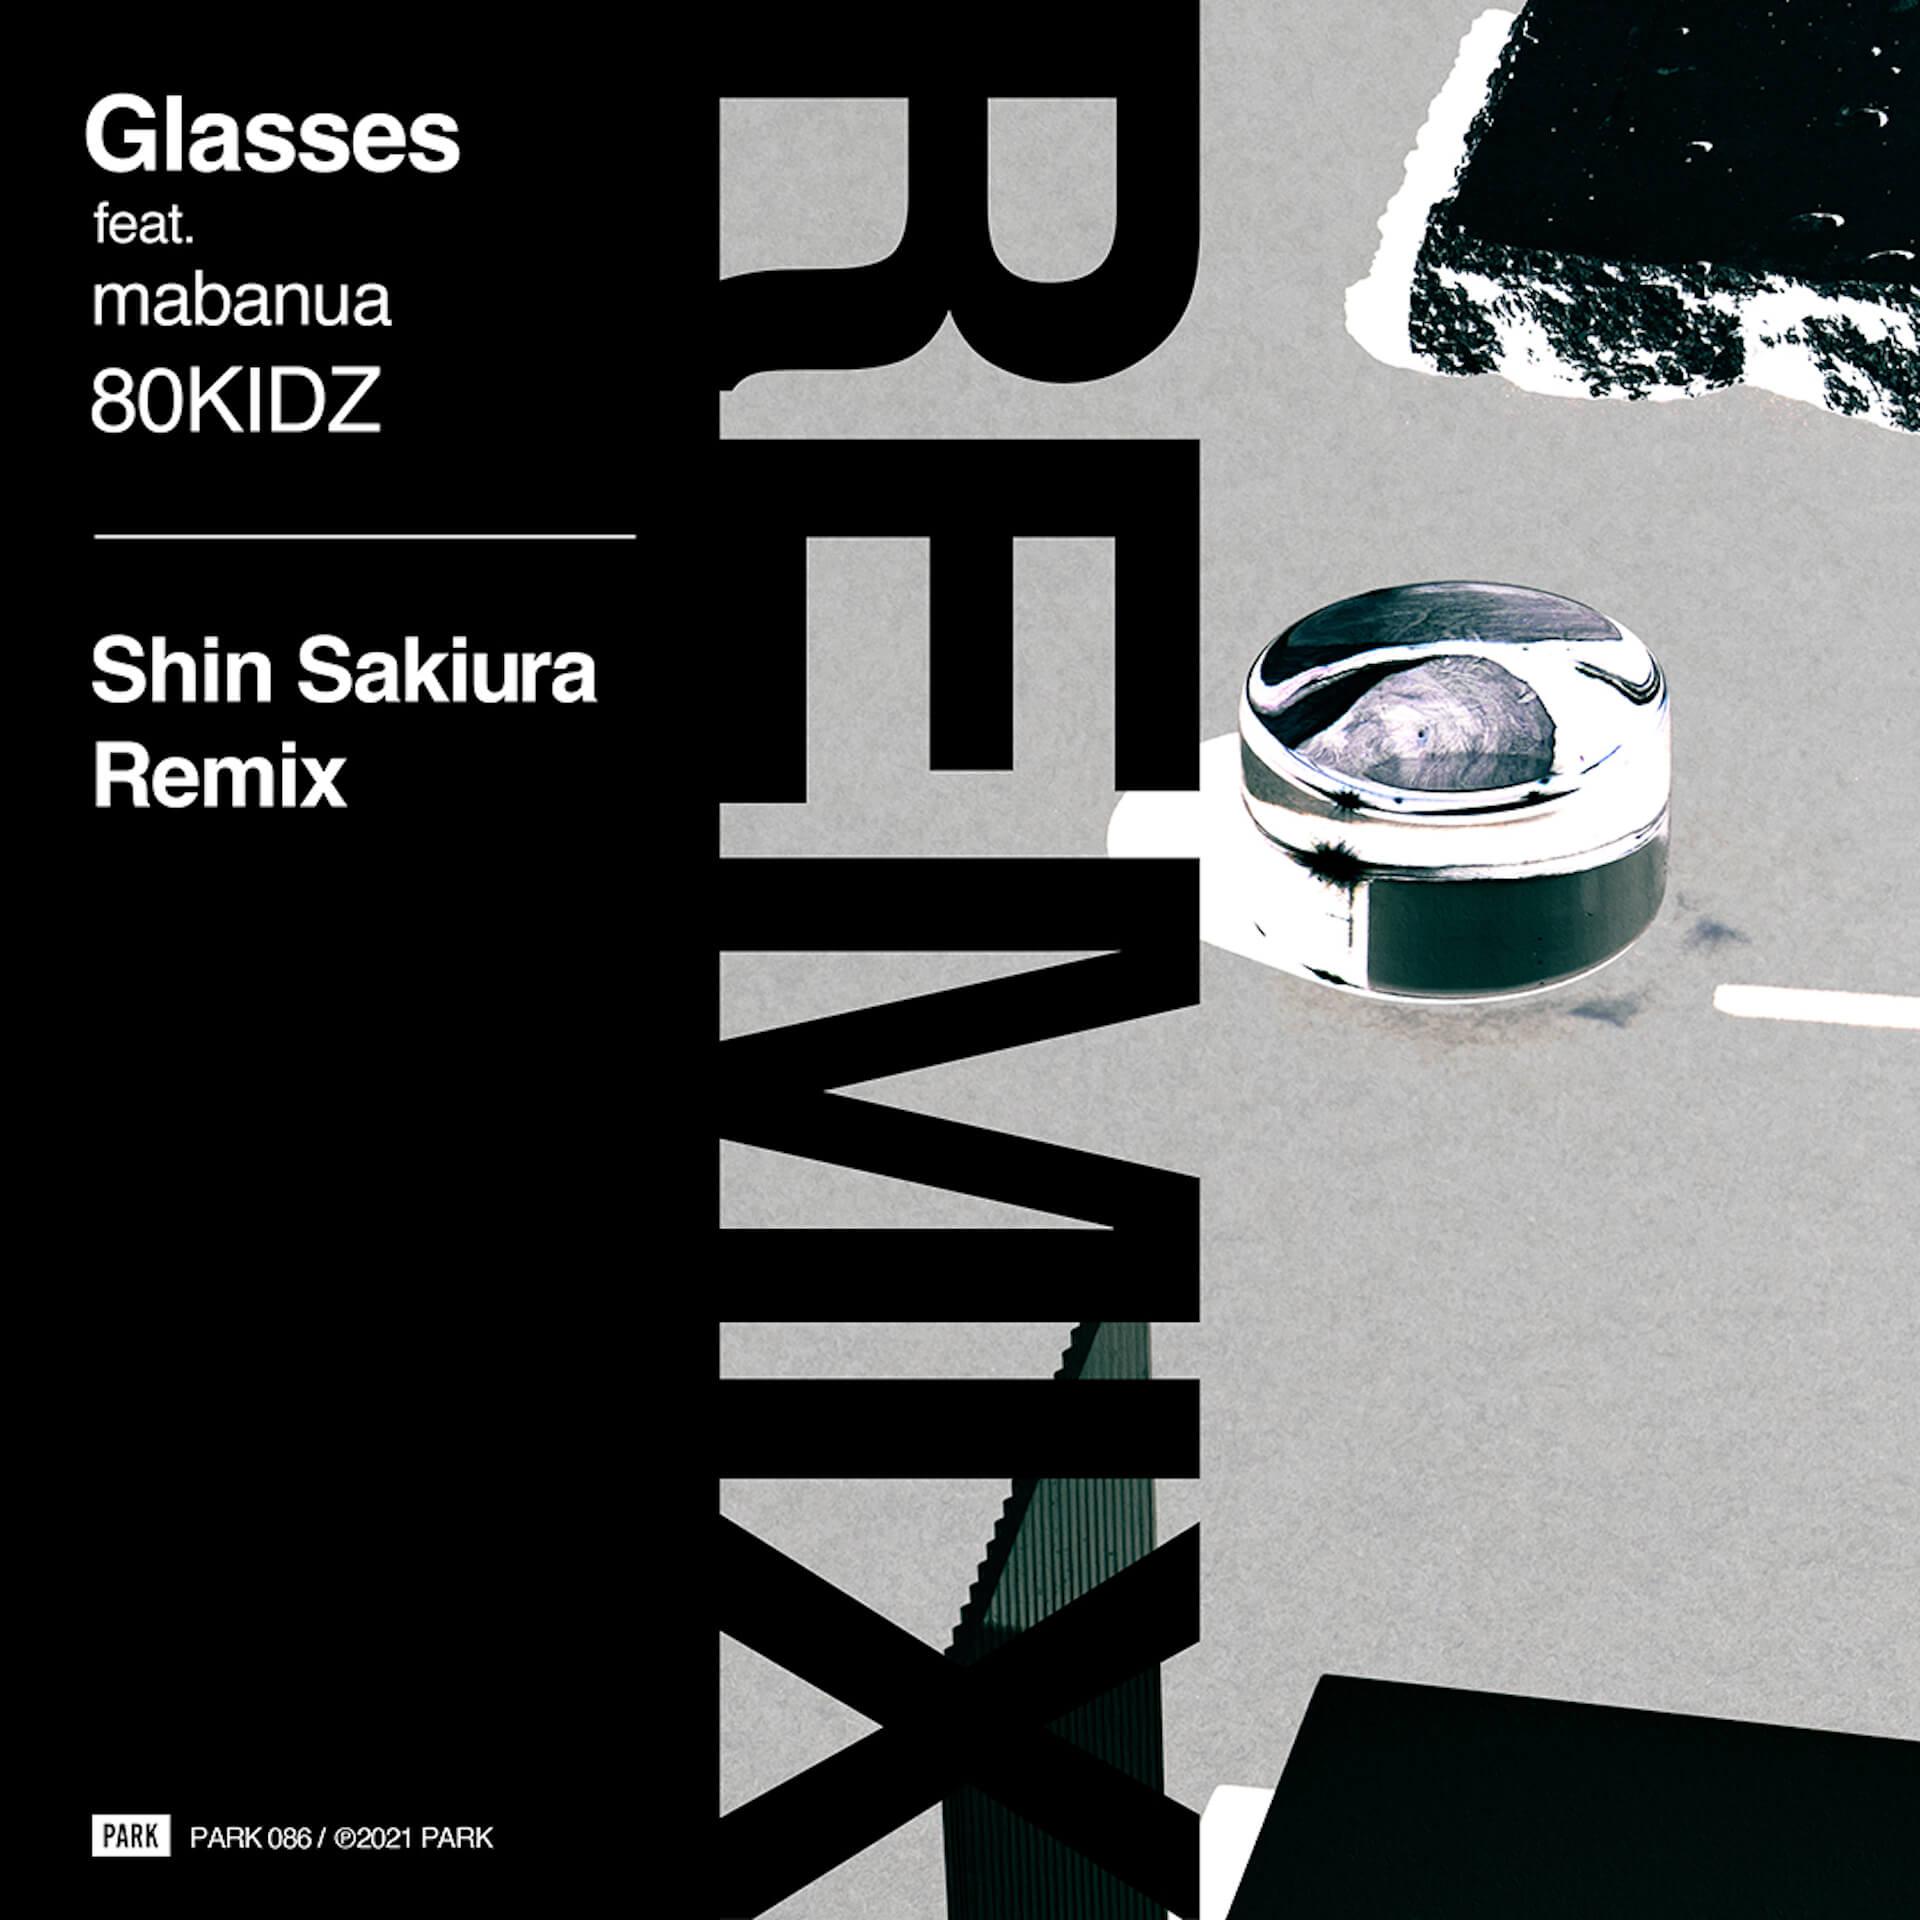 "80KIDZとmabanuaのコラボ楽曲""Glasses""をShin Sakiuraがリミックス!7インチレコードのB面にも収録決定 music210408_80kidz-210408_1"